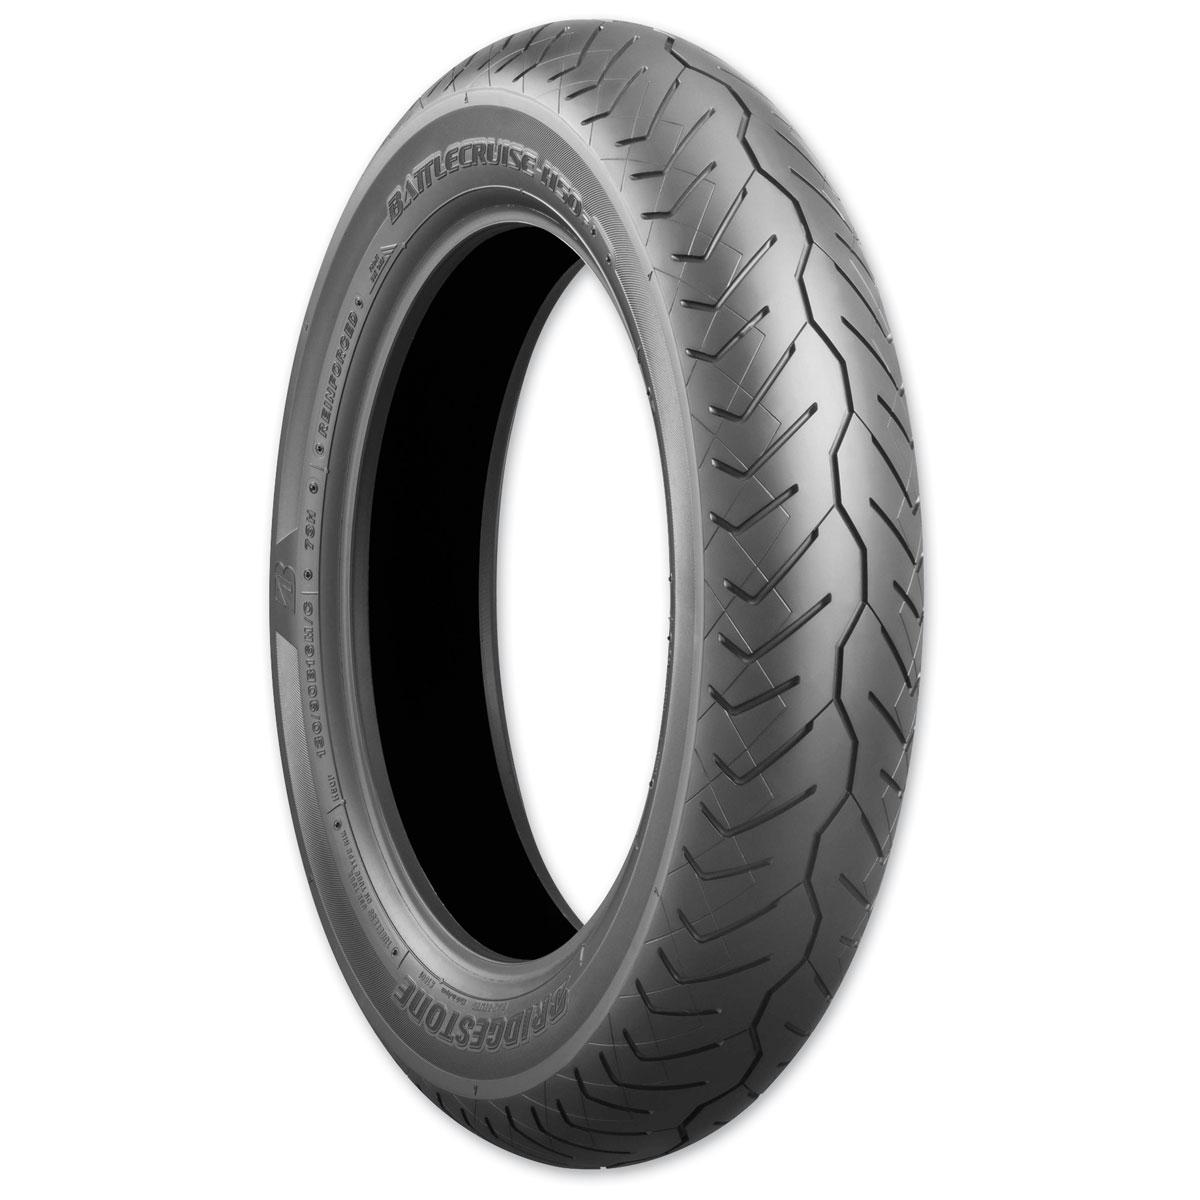 Bridgestone Battlecruise H50 200/55R17 Rear Tire